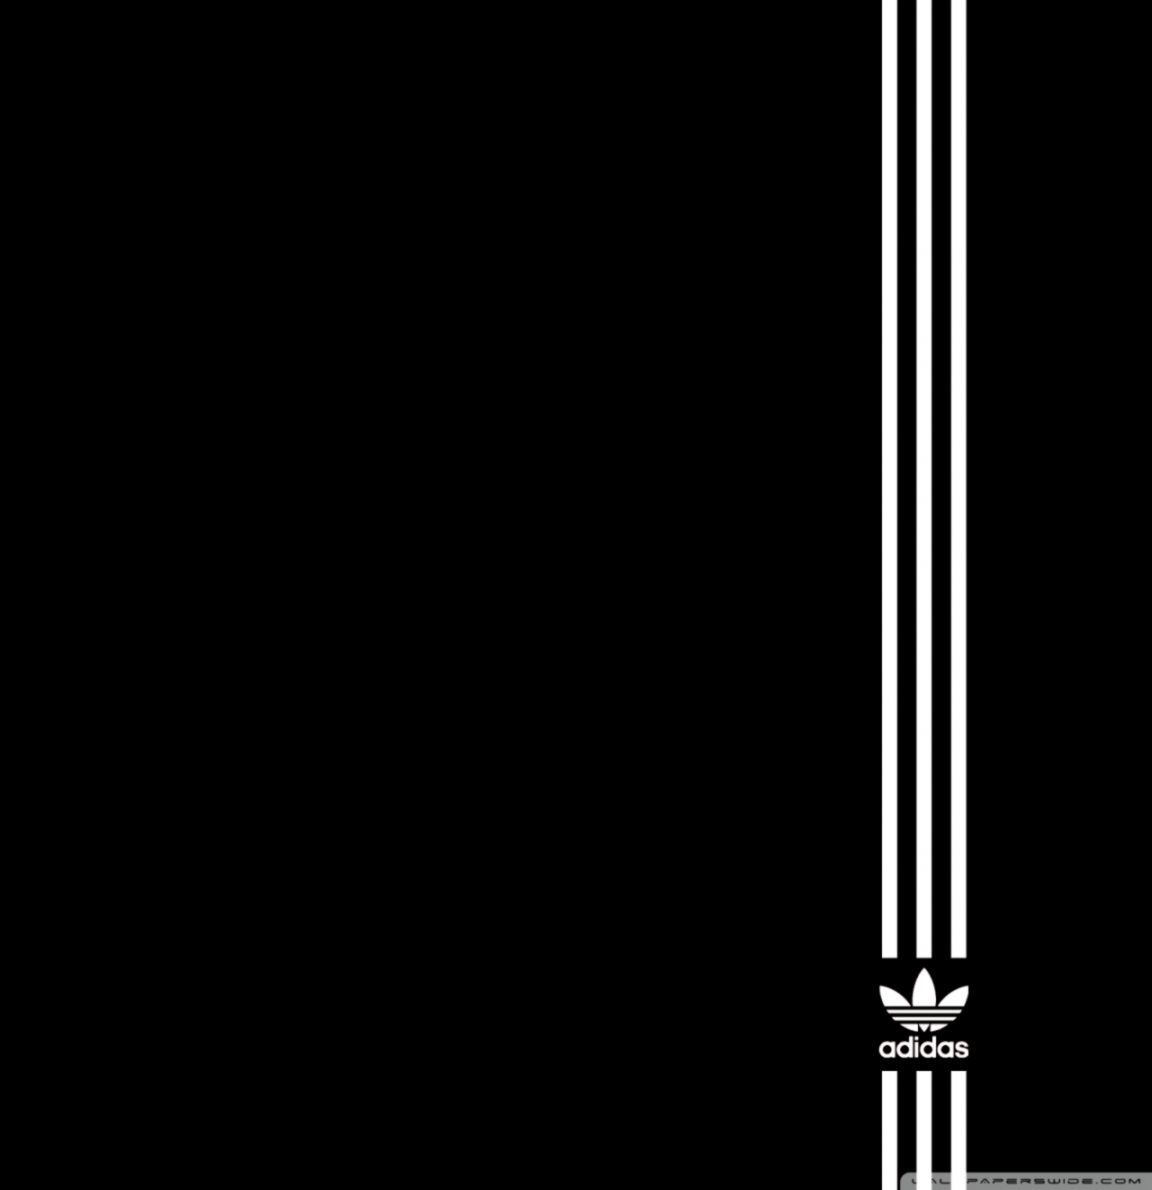 Black On Black Wallpaper Nababan Wallpapers